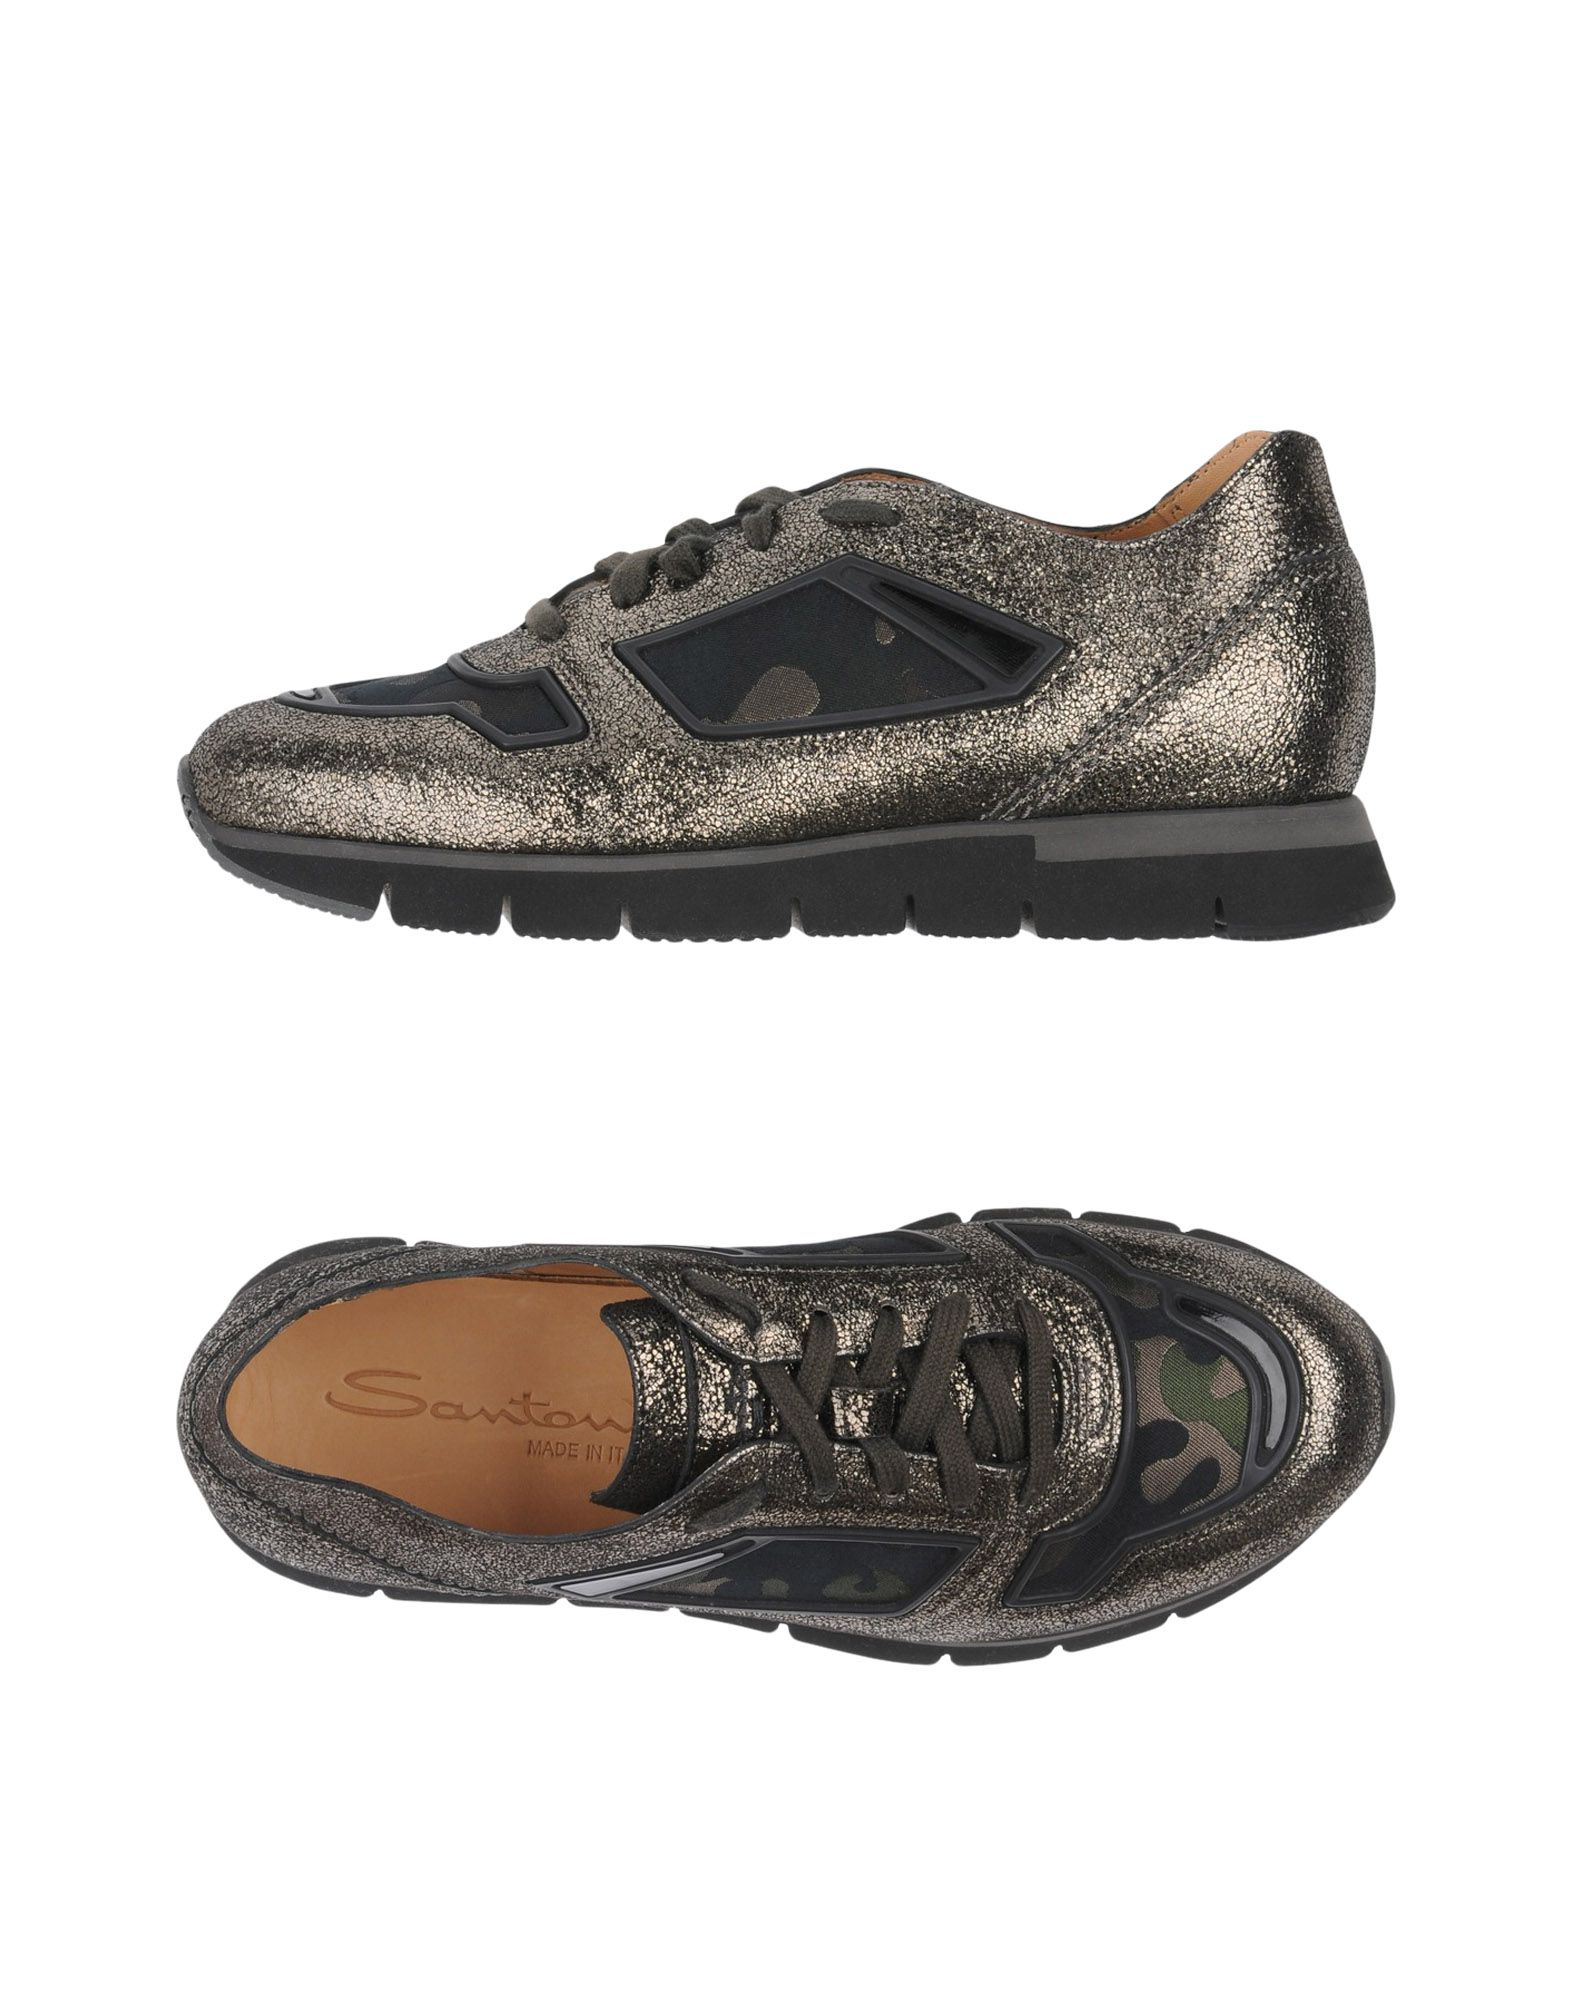 Santoni Sneakers Sneakers - Women Santoni Sneakers Santoni online on  Australia - 11290754NN 7a15d7